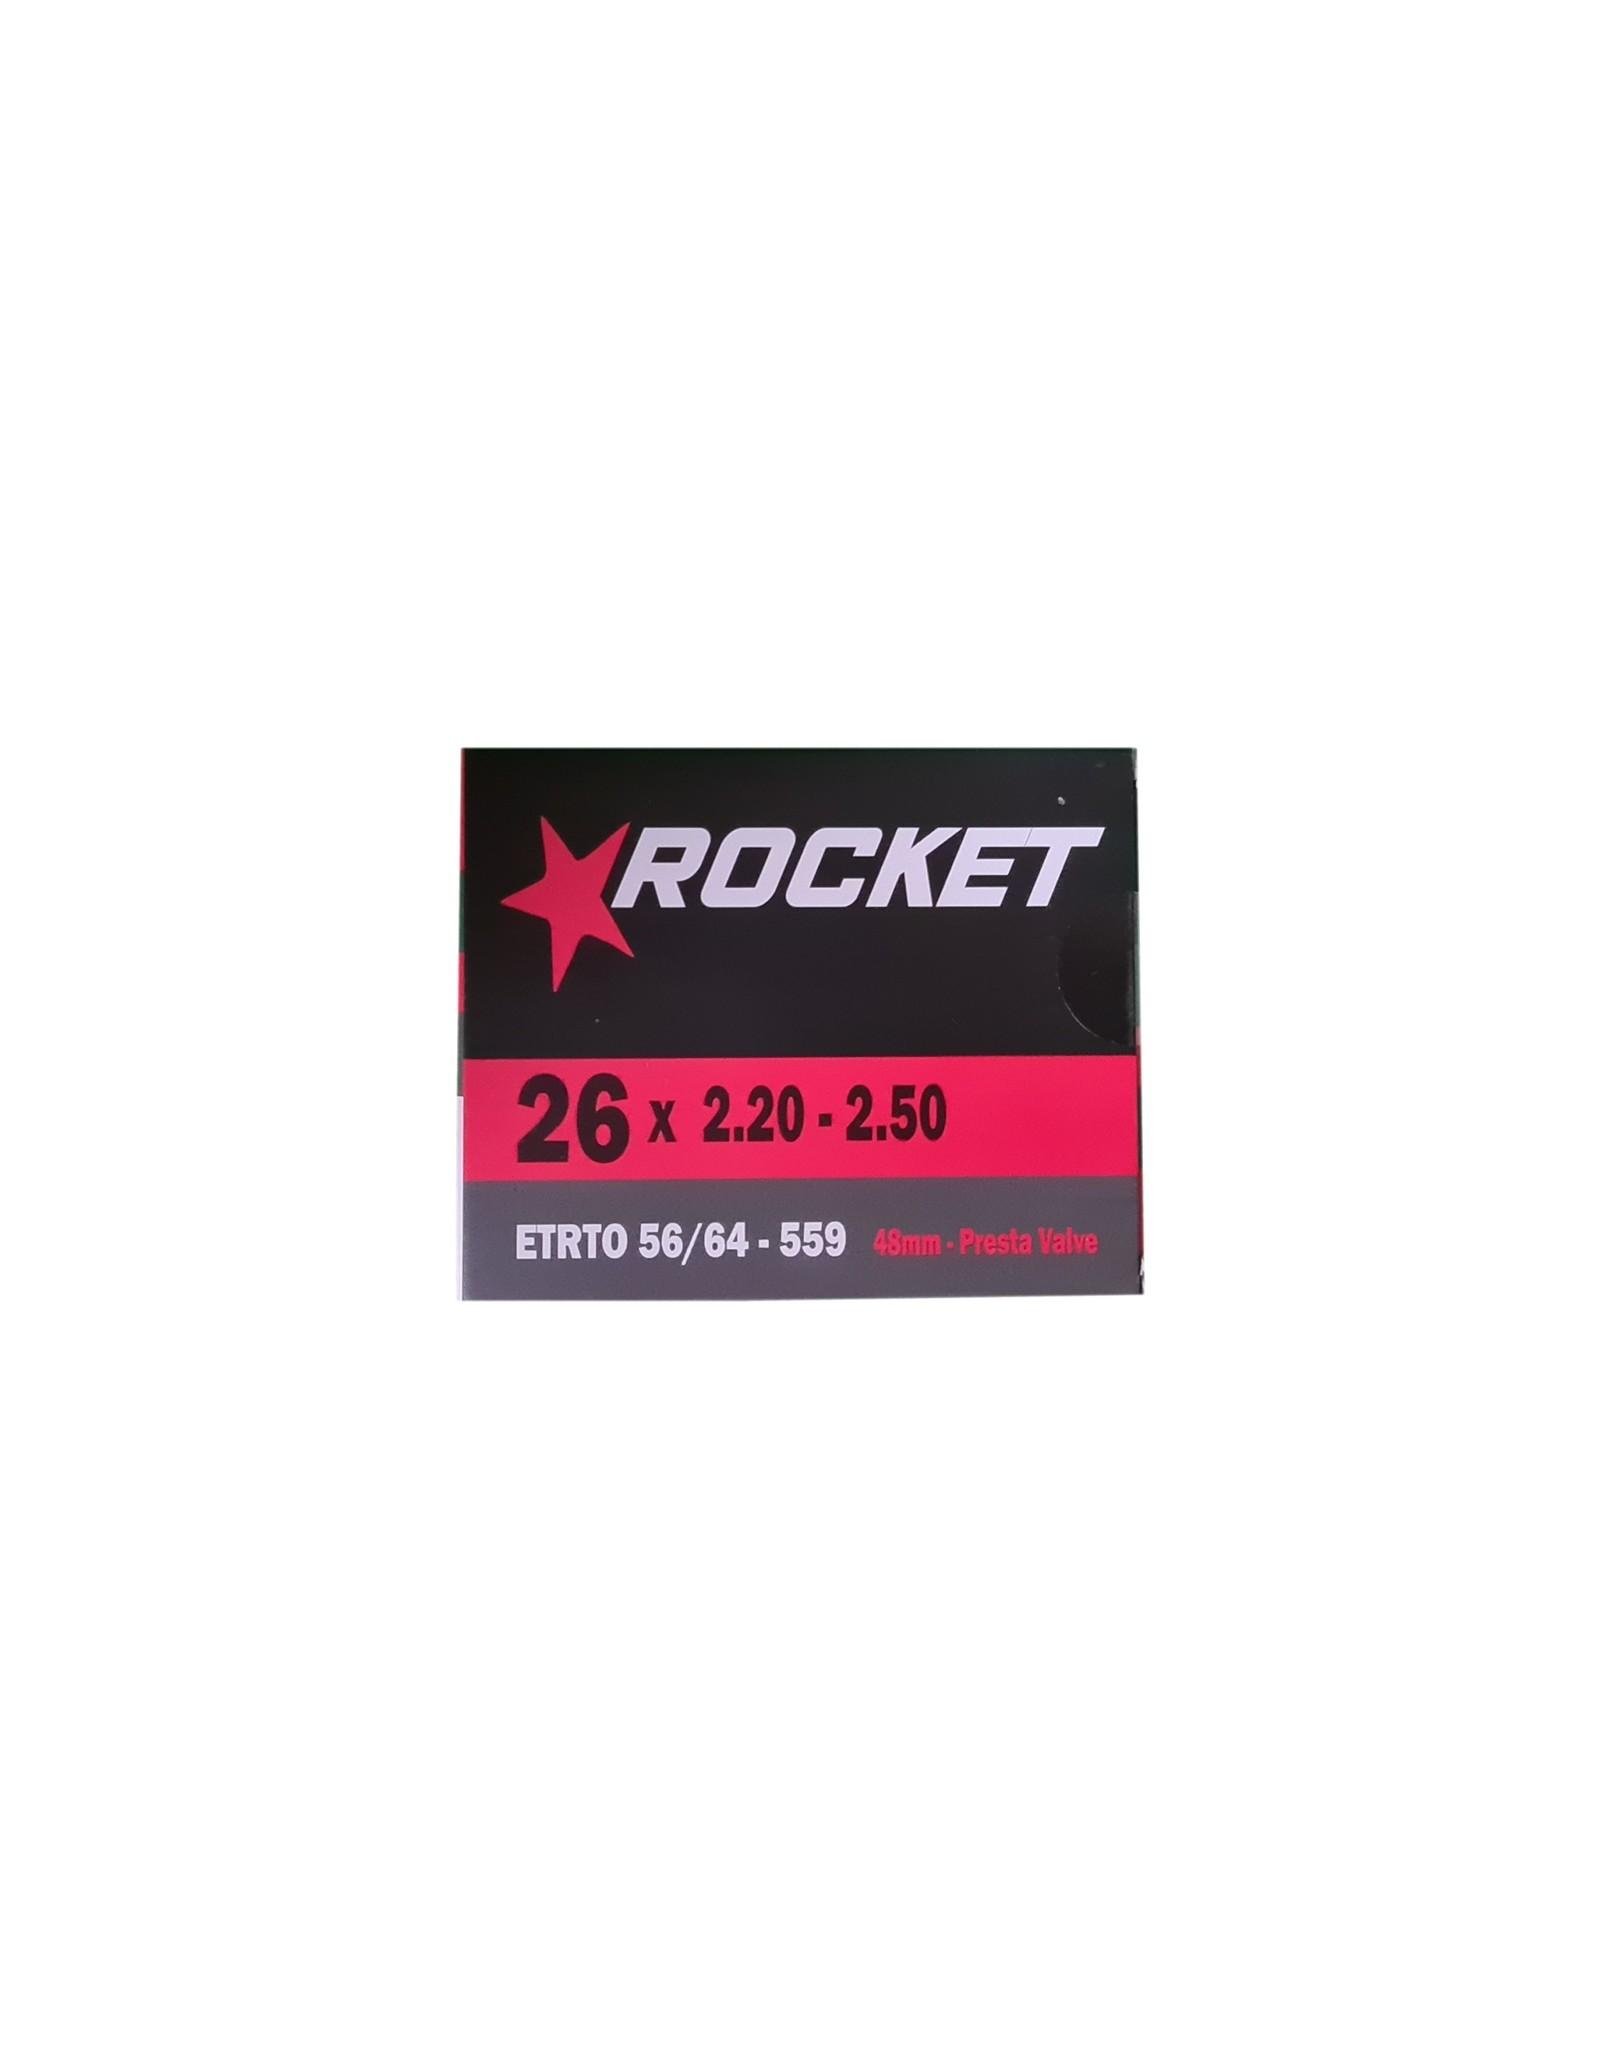 "Rocket Butyl Inner Tube 26 x 2.20-2.50"" Presta Valve 48mm"